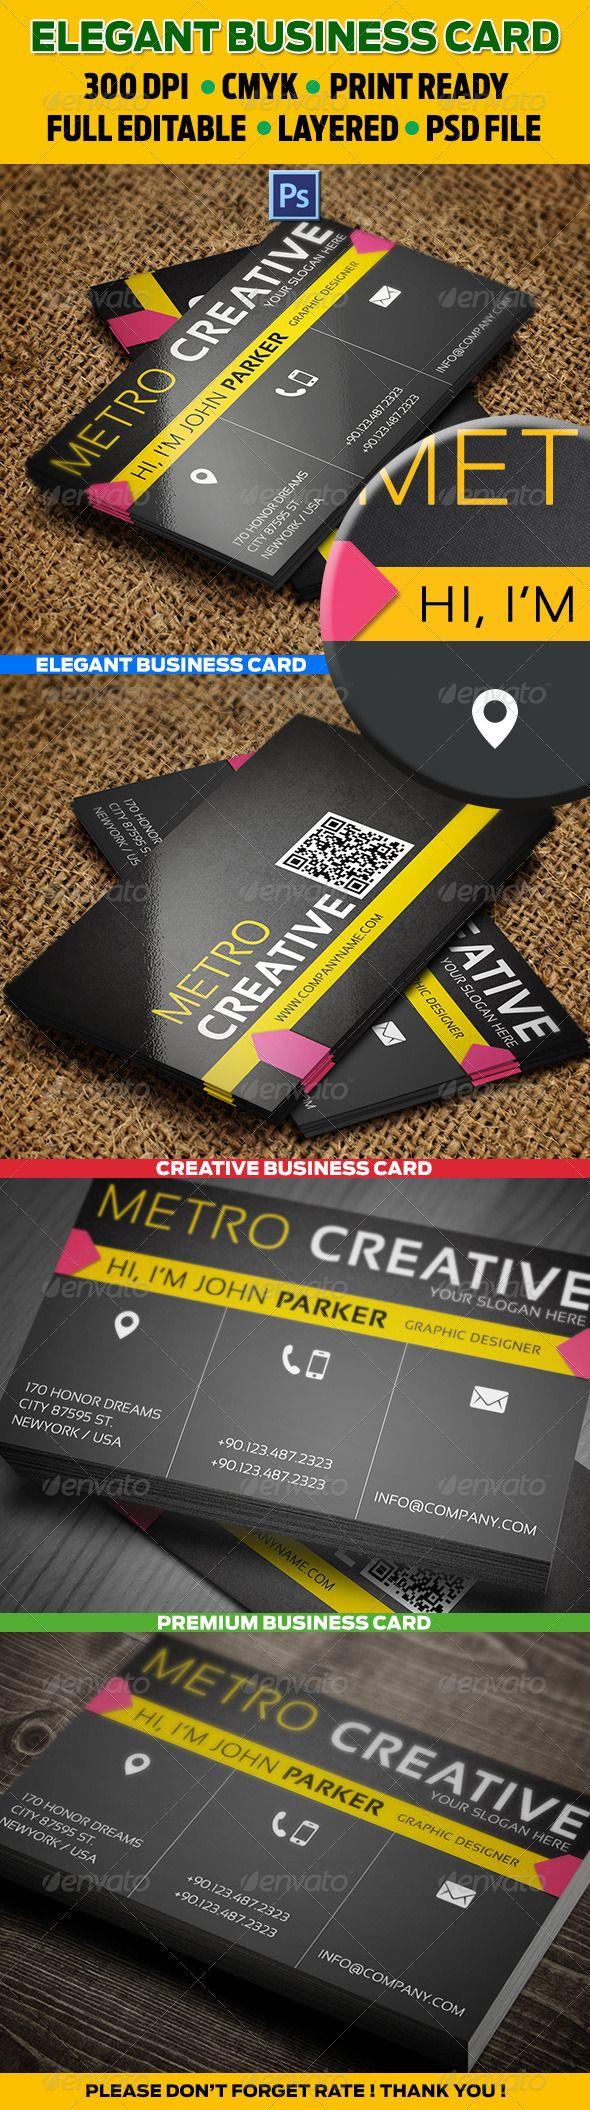 112 best print templates images on pinterest modelos de impresso creative business card 53 reheart Gallery